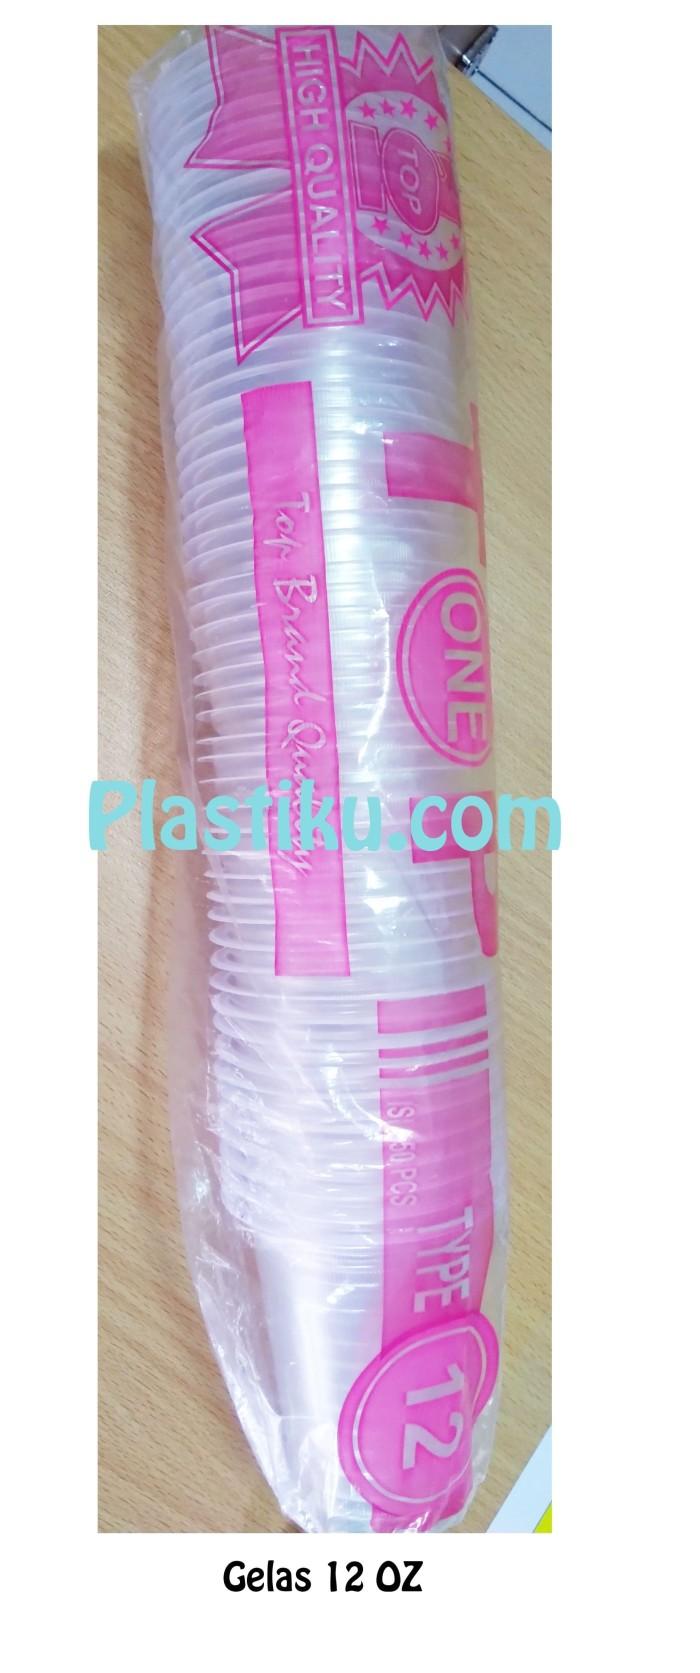 Foto Produk Gelas plastik 12 OZ dari toko plastiku